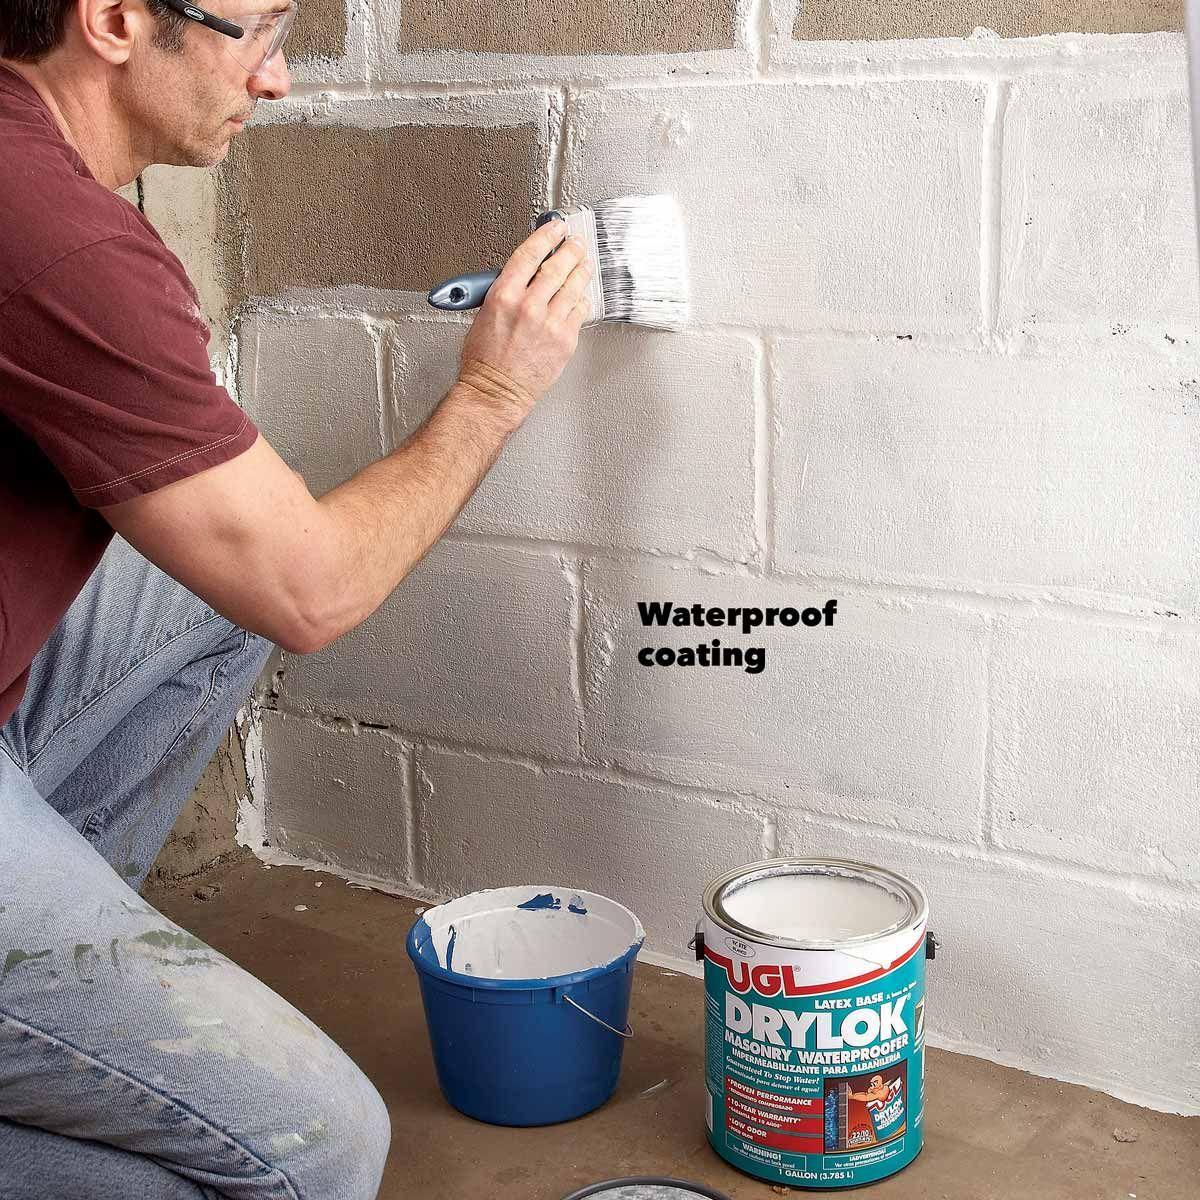 Do Waterproof Coatings Really Work Waterproofing Basement Wet